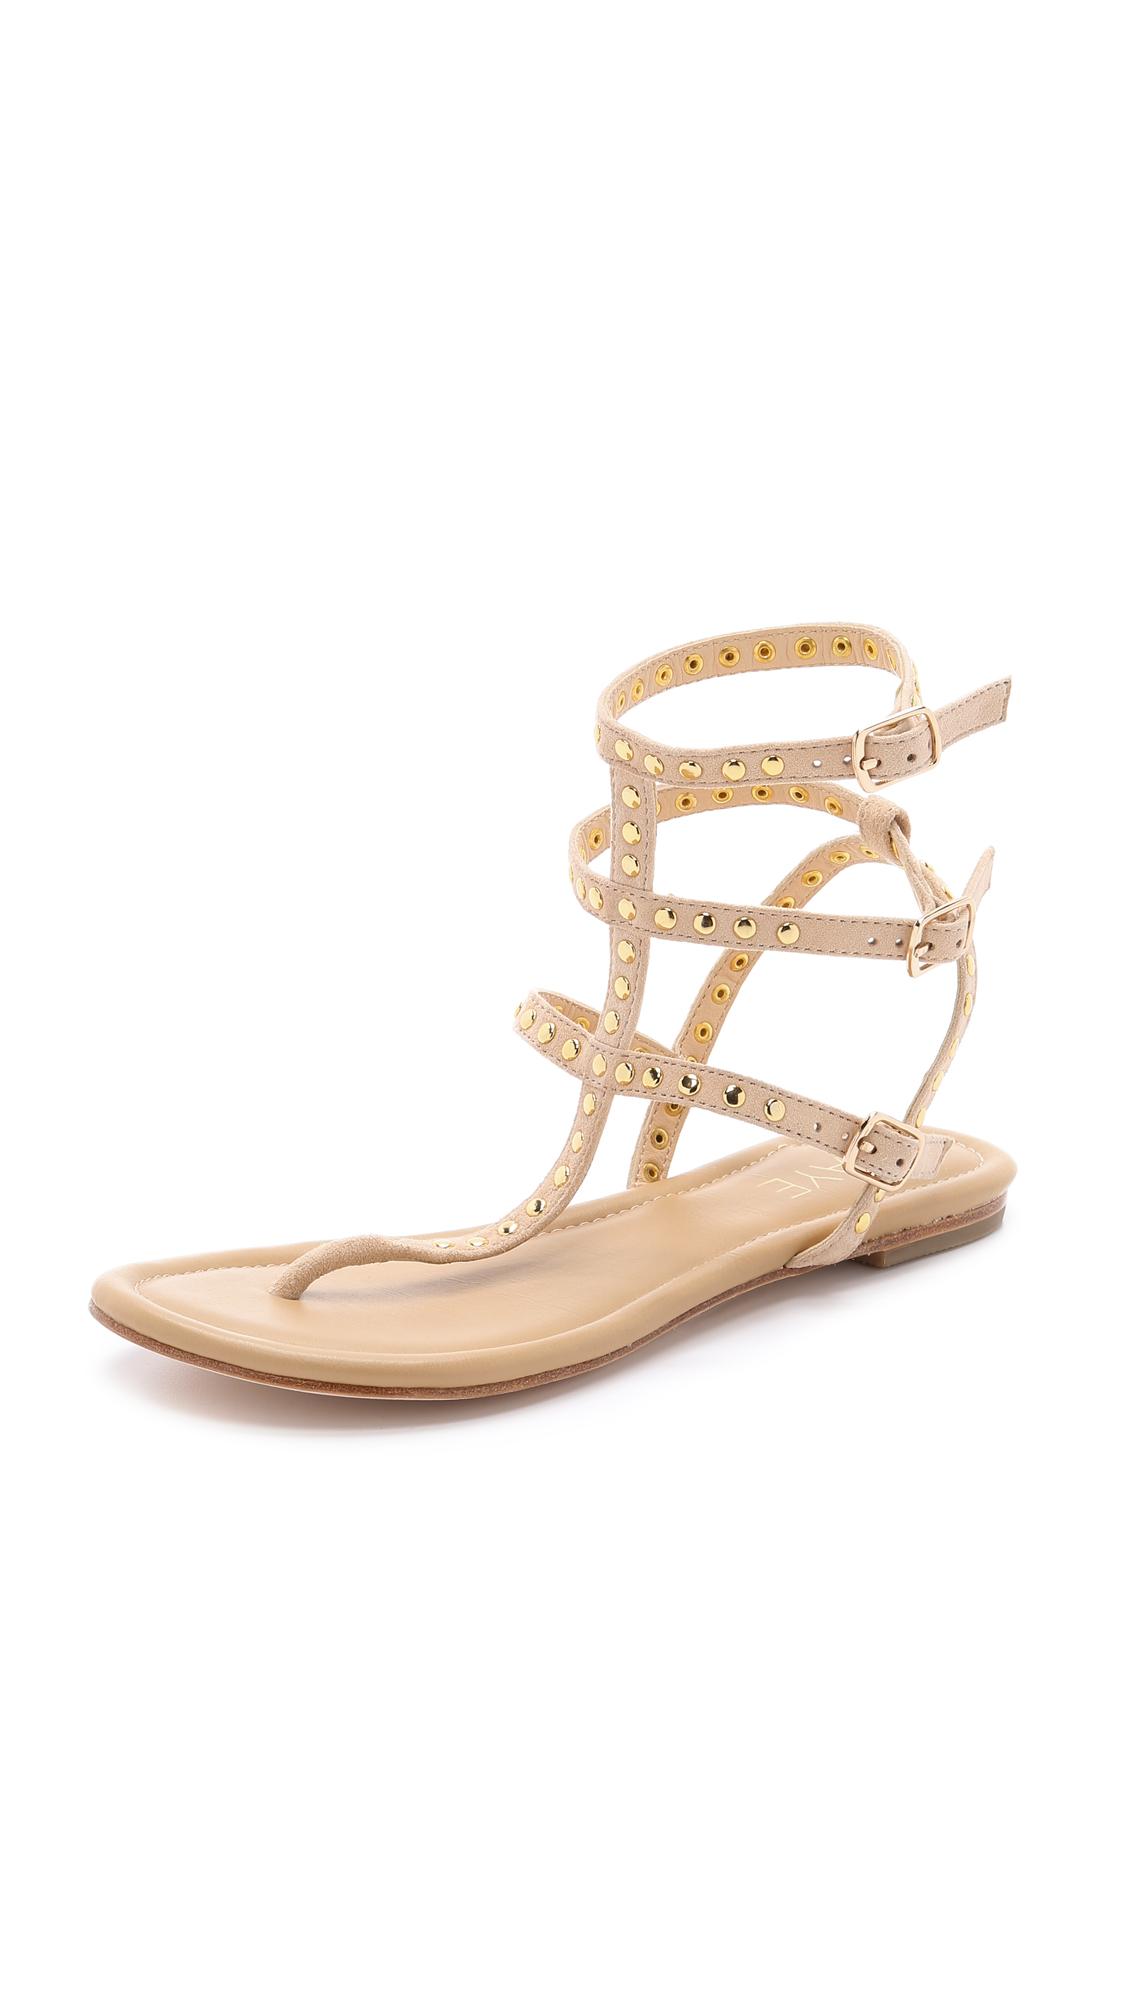 899ea80d52e40a Raye Sylvie Studded Sandals